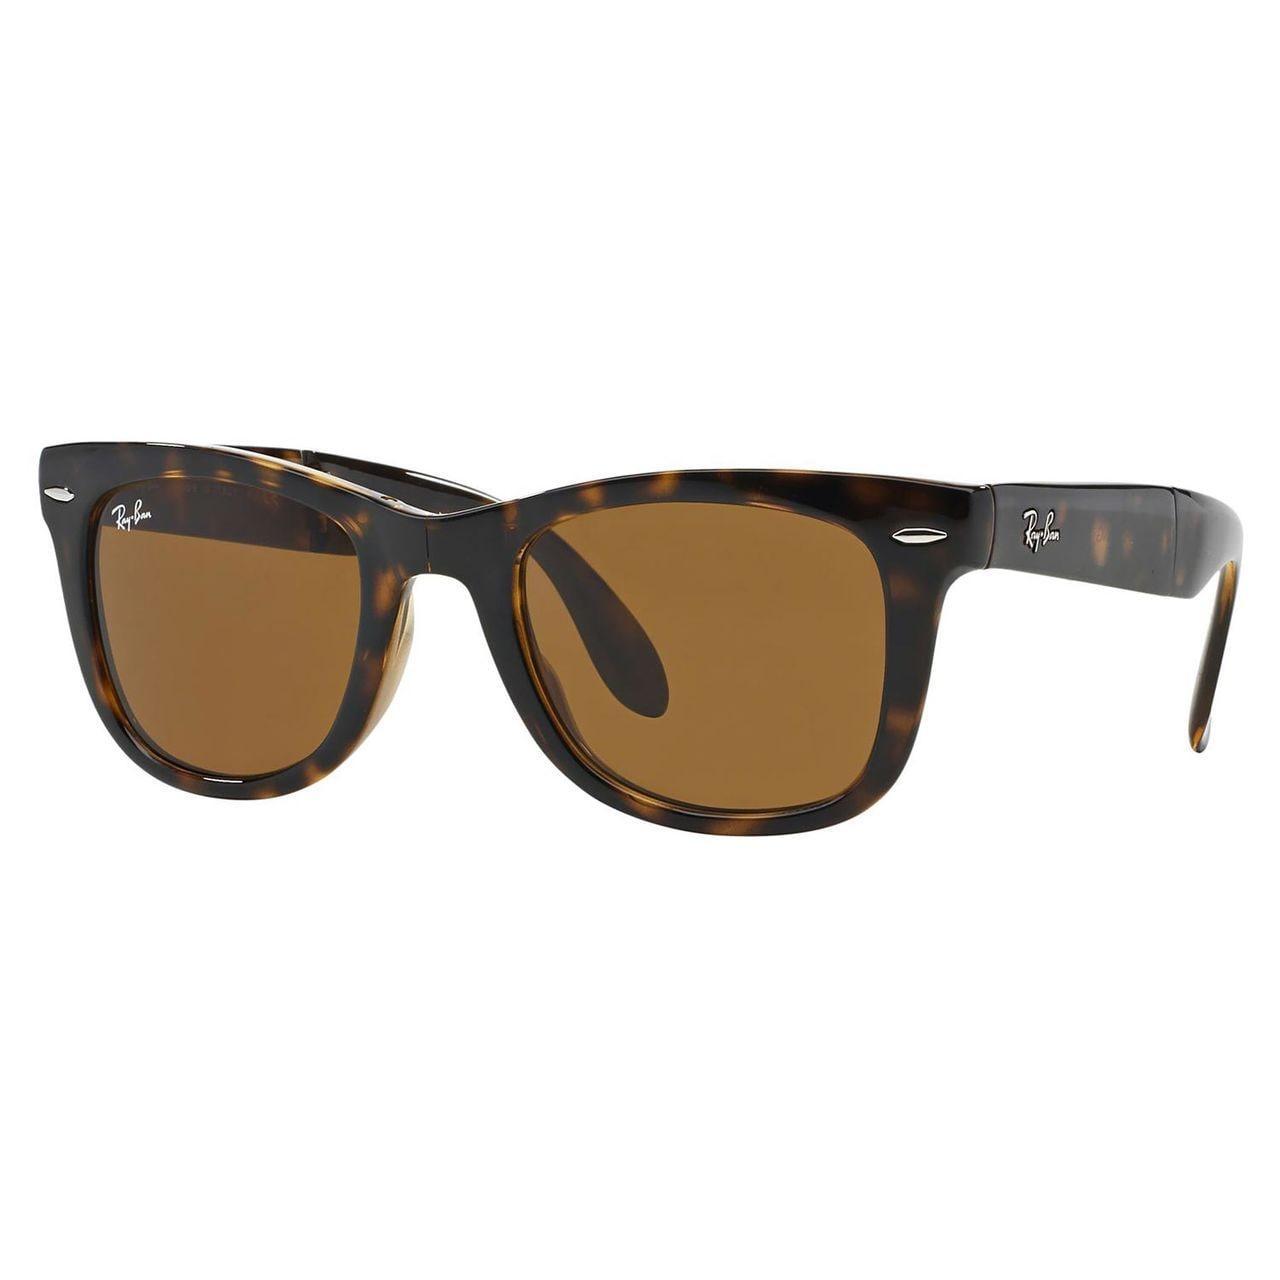 ee02080cfa9 Ray-Ban Wayfarer Folding RB4105 Tortoise Frame Brown Gradient Lens  Sunglasses